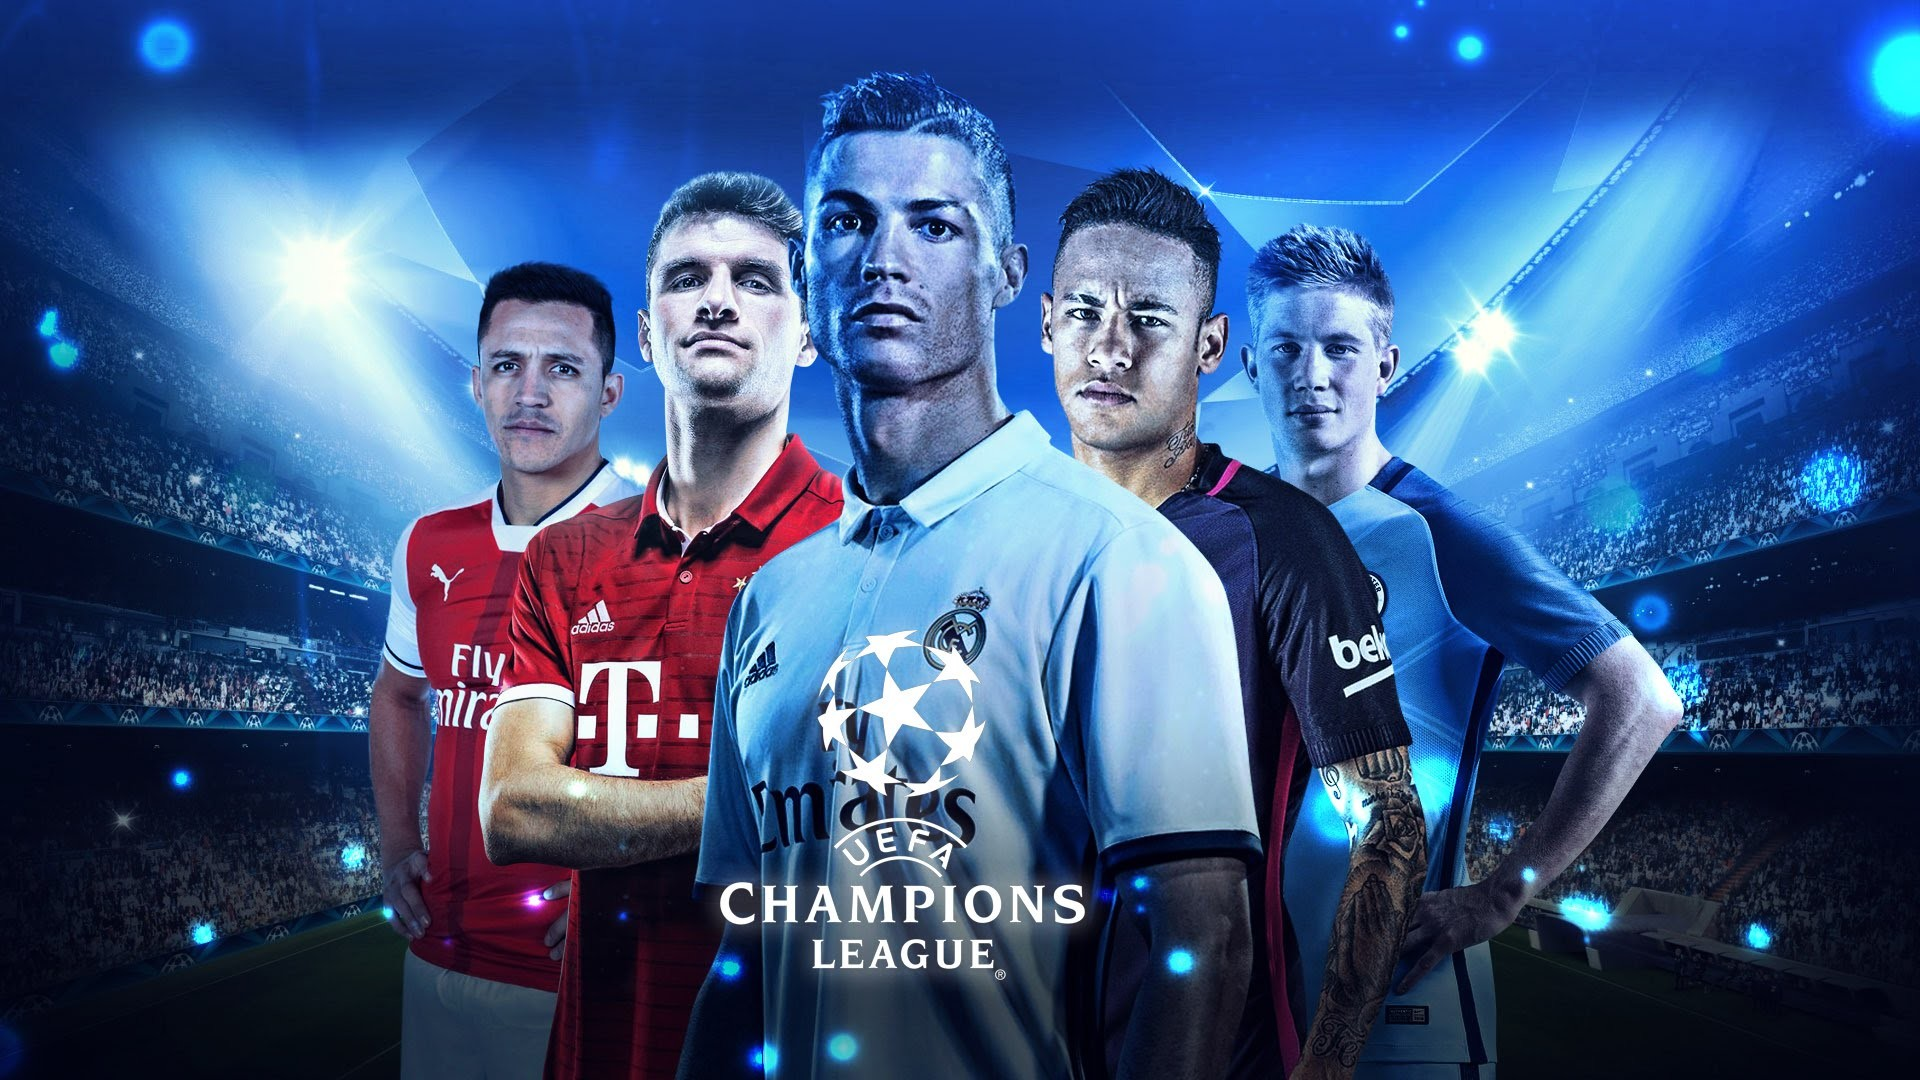 champions league - HD1920×1080